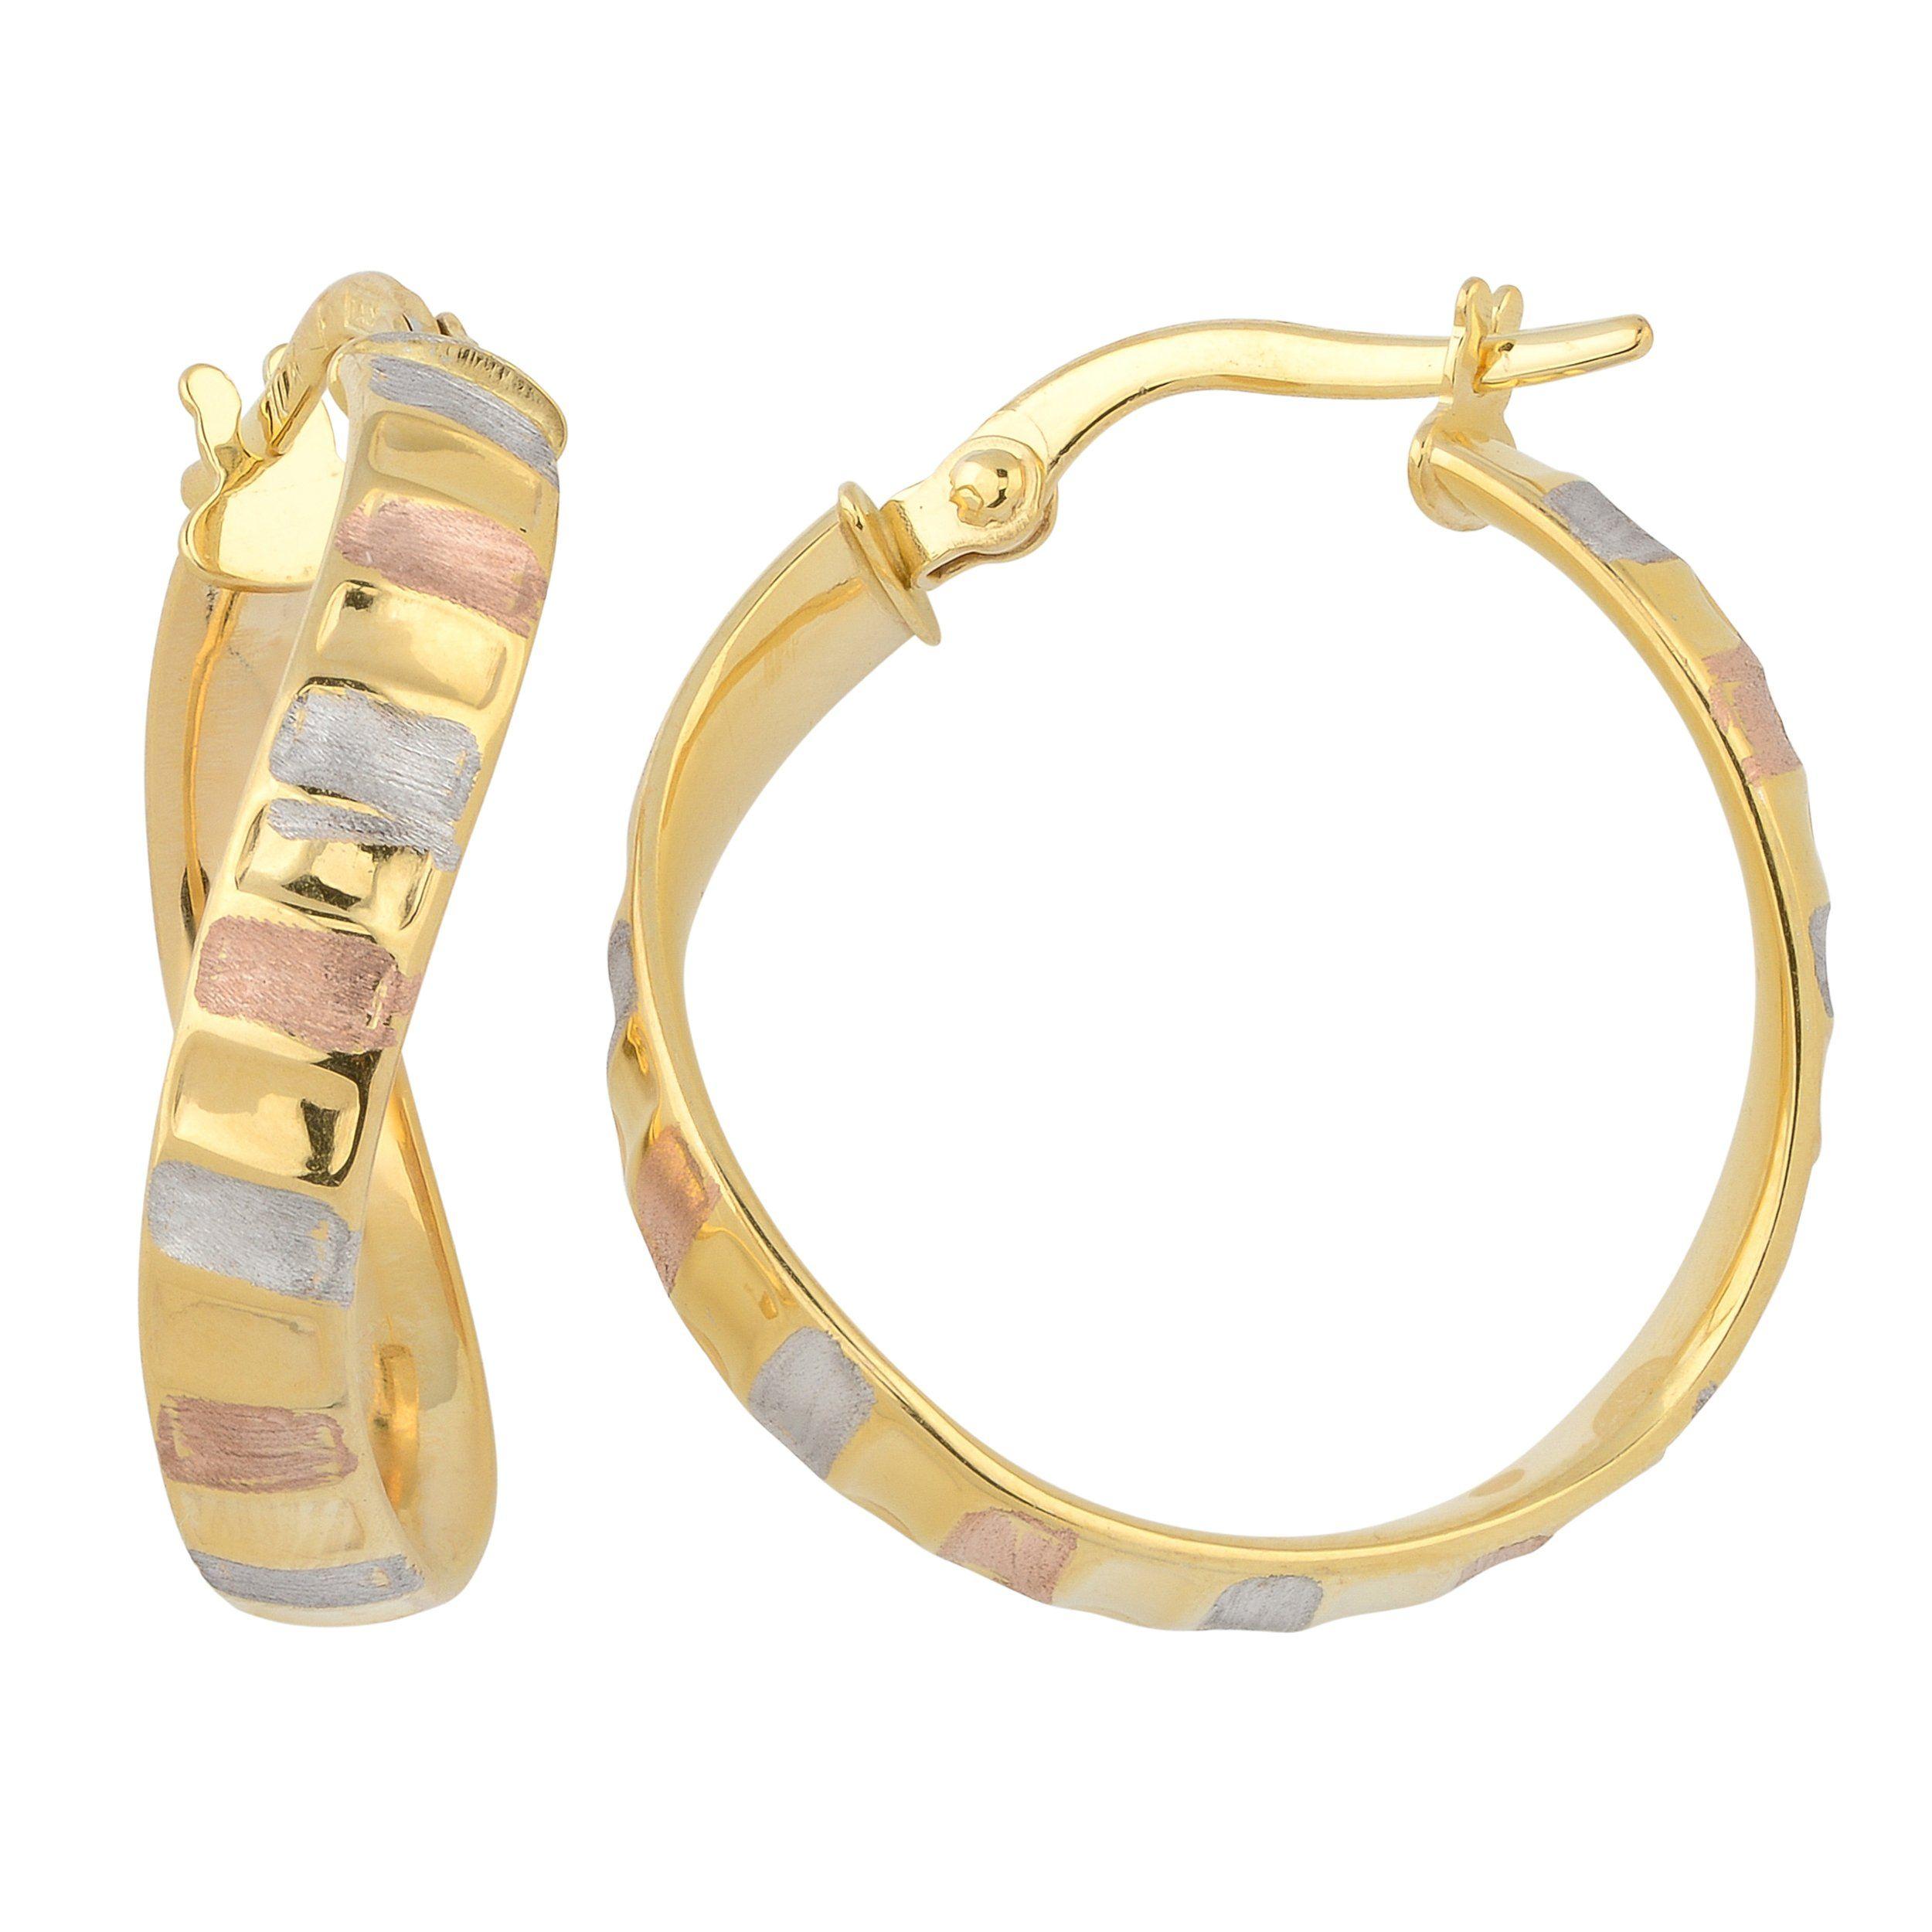 K tricolor gold satin finish ripple design surface twist hoop